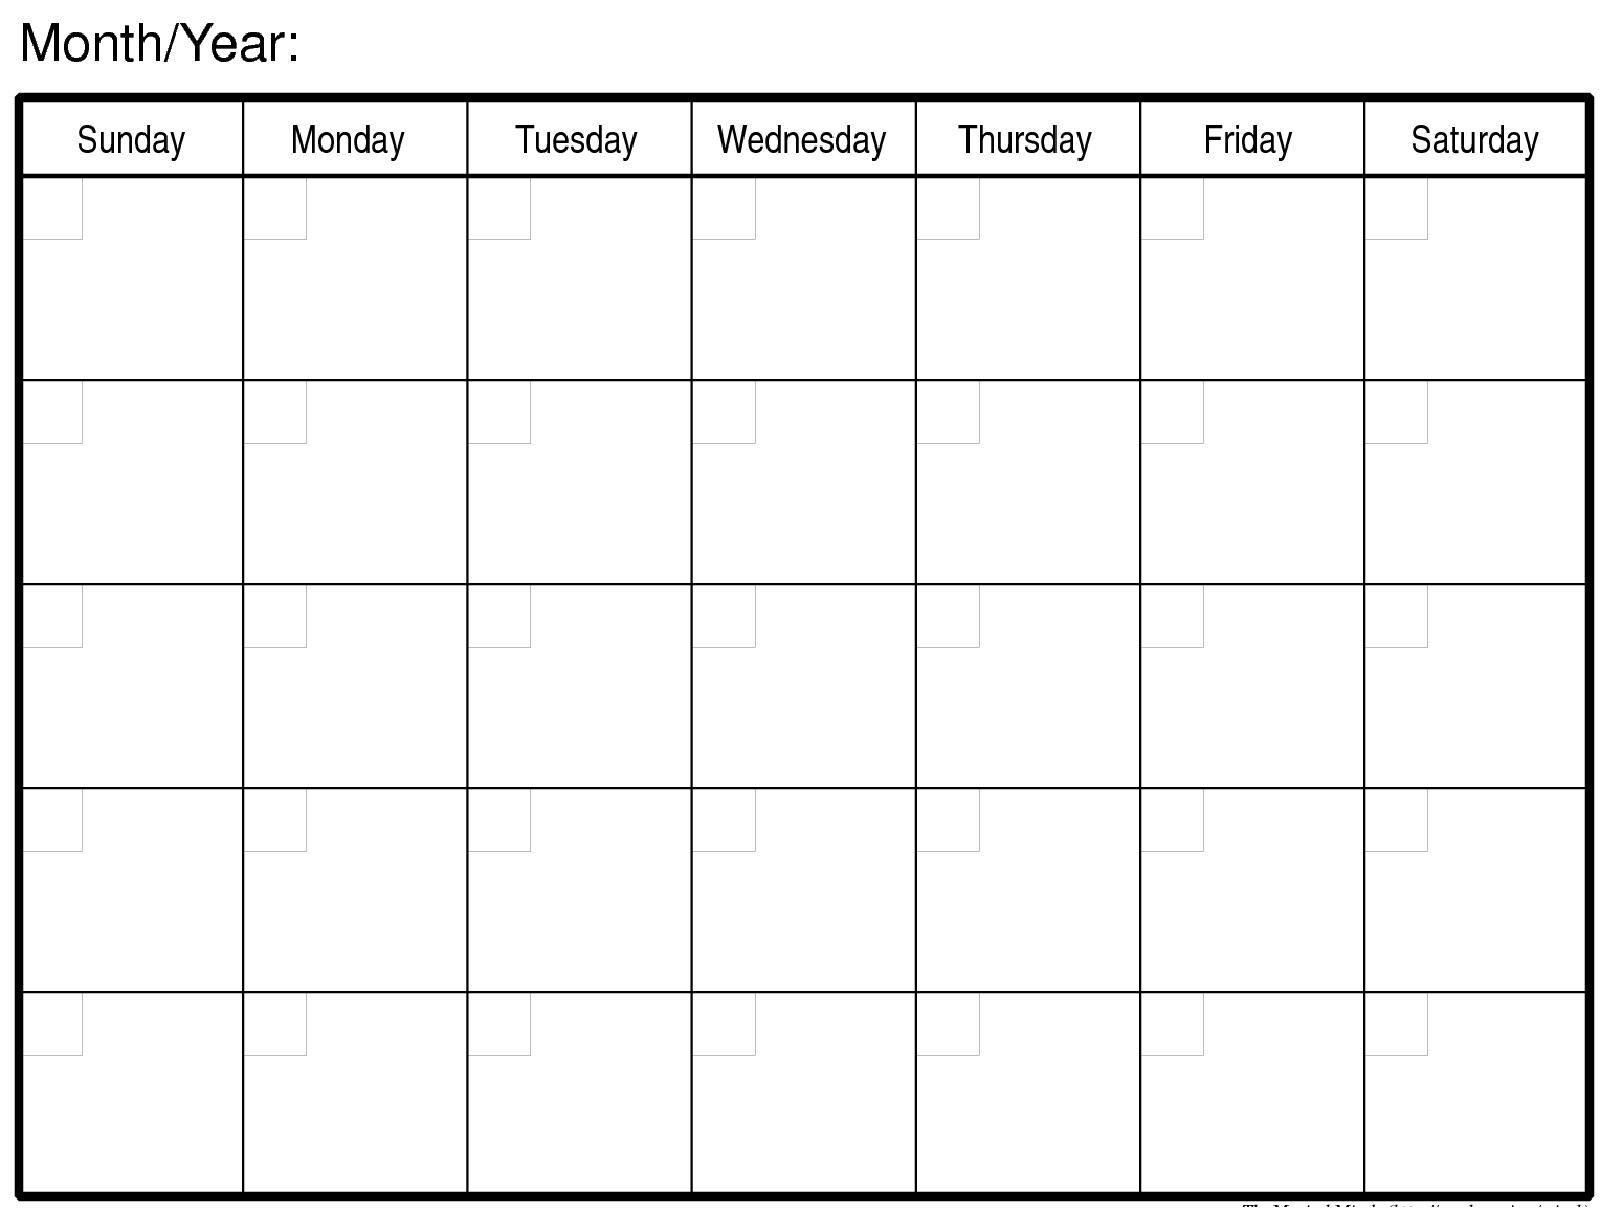 Monthly Calendar   Turexa   Blank Monthly Calendar, Monthly Blank Monday Through Friday Month Calendar Template